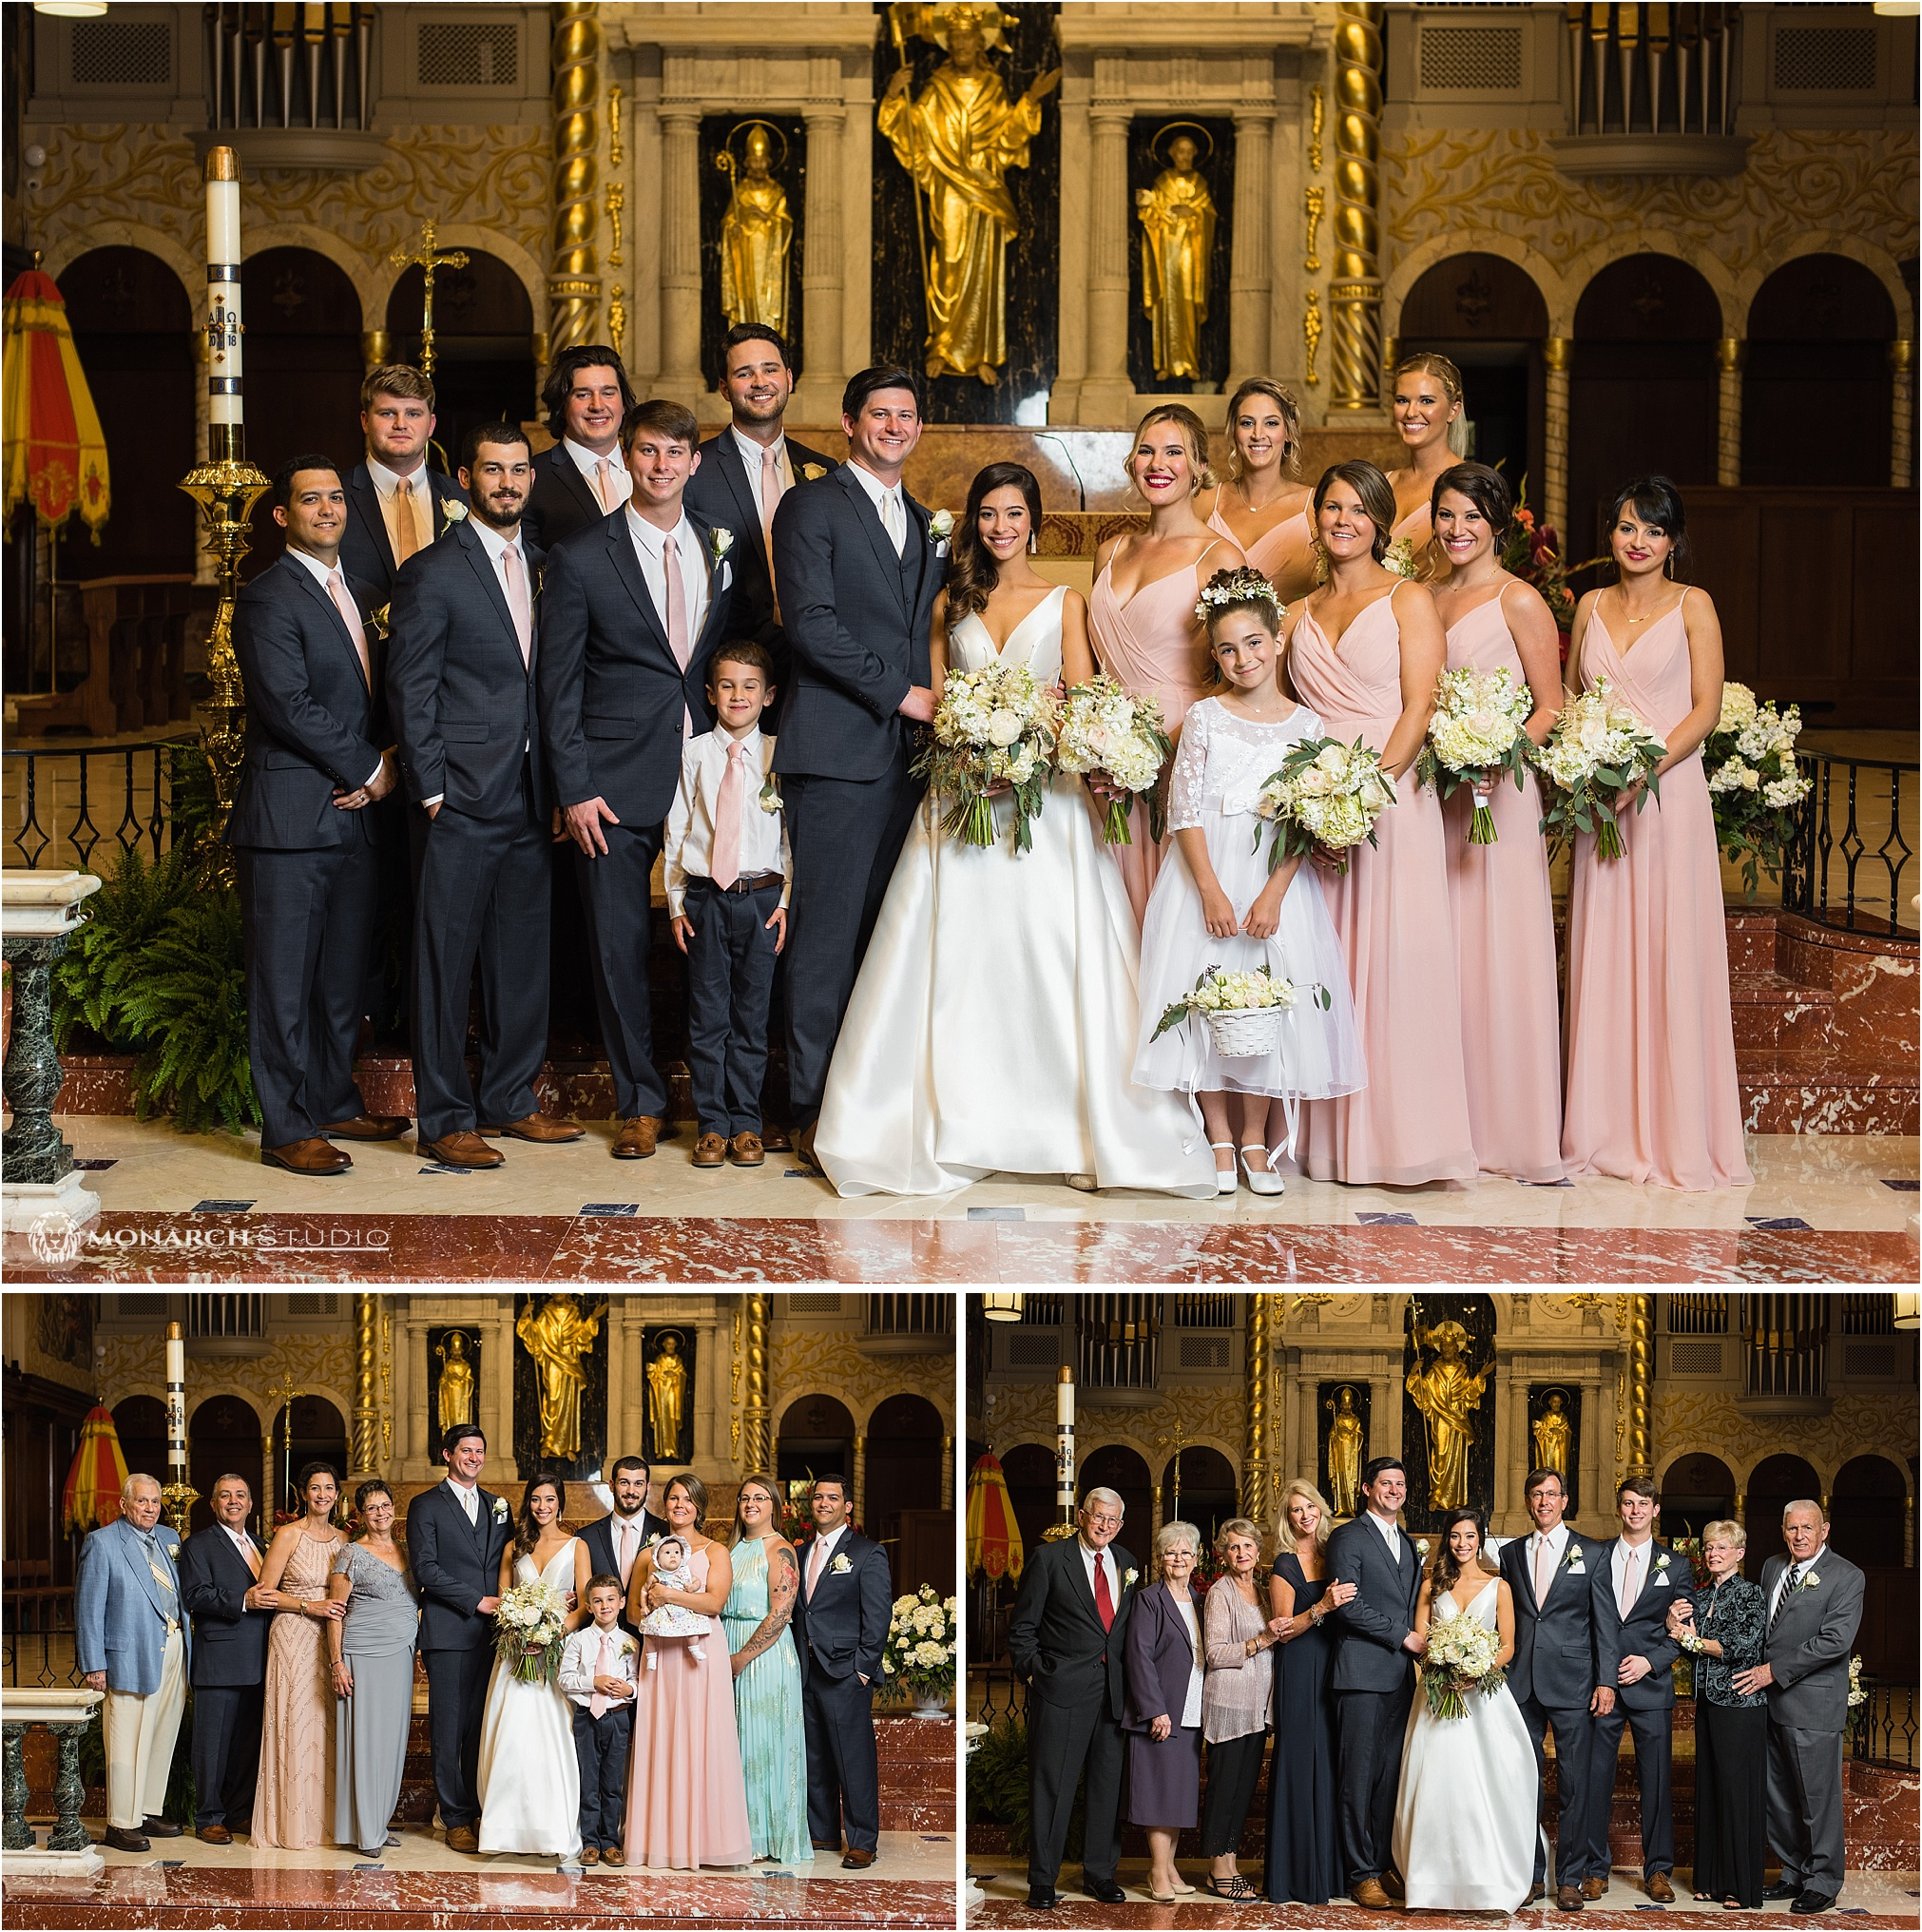 st-augustine-wedding-photographer-080.jpg